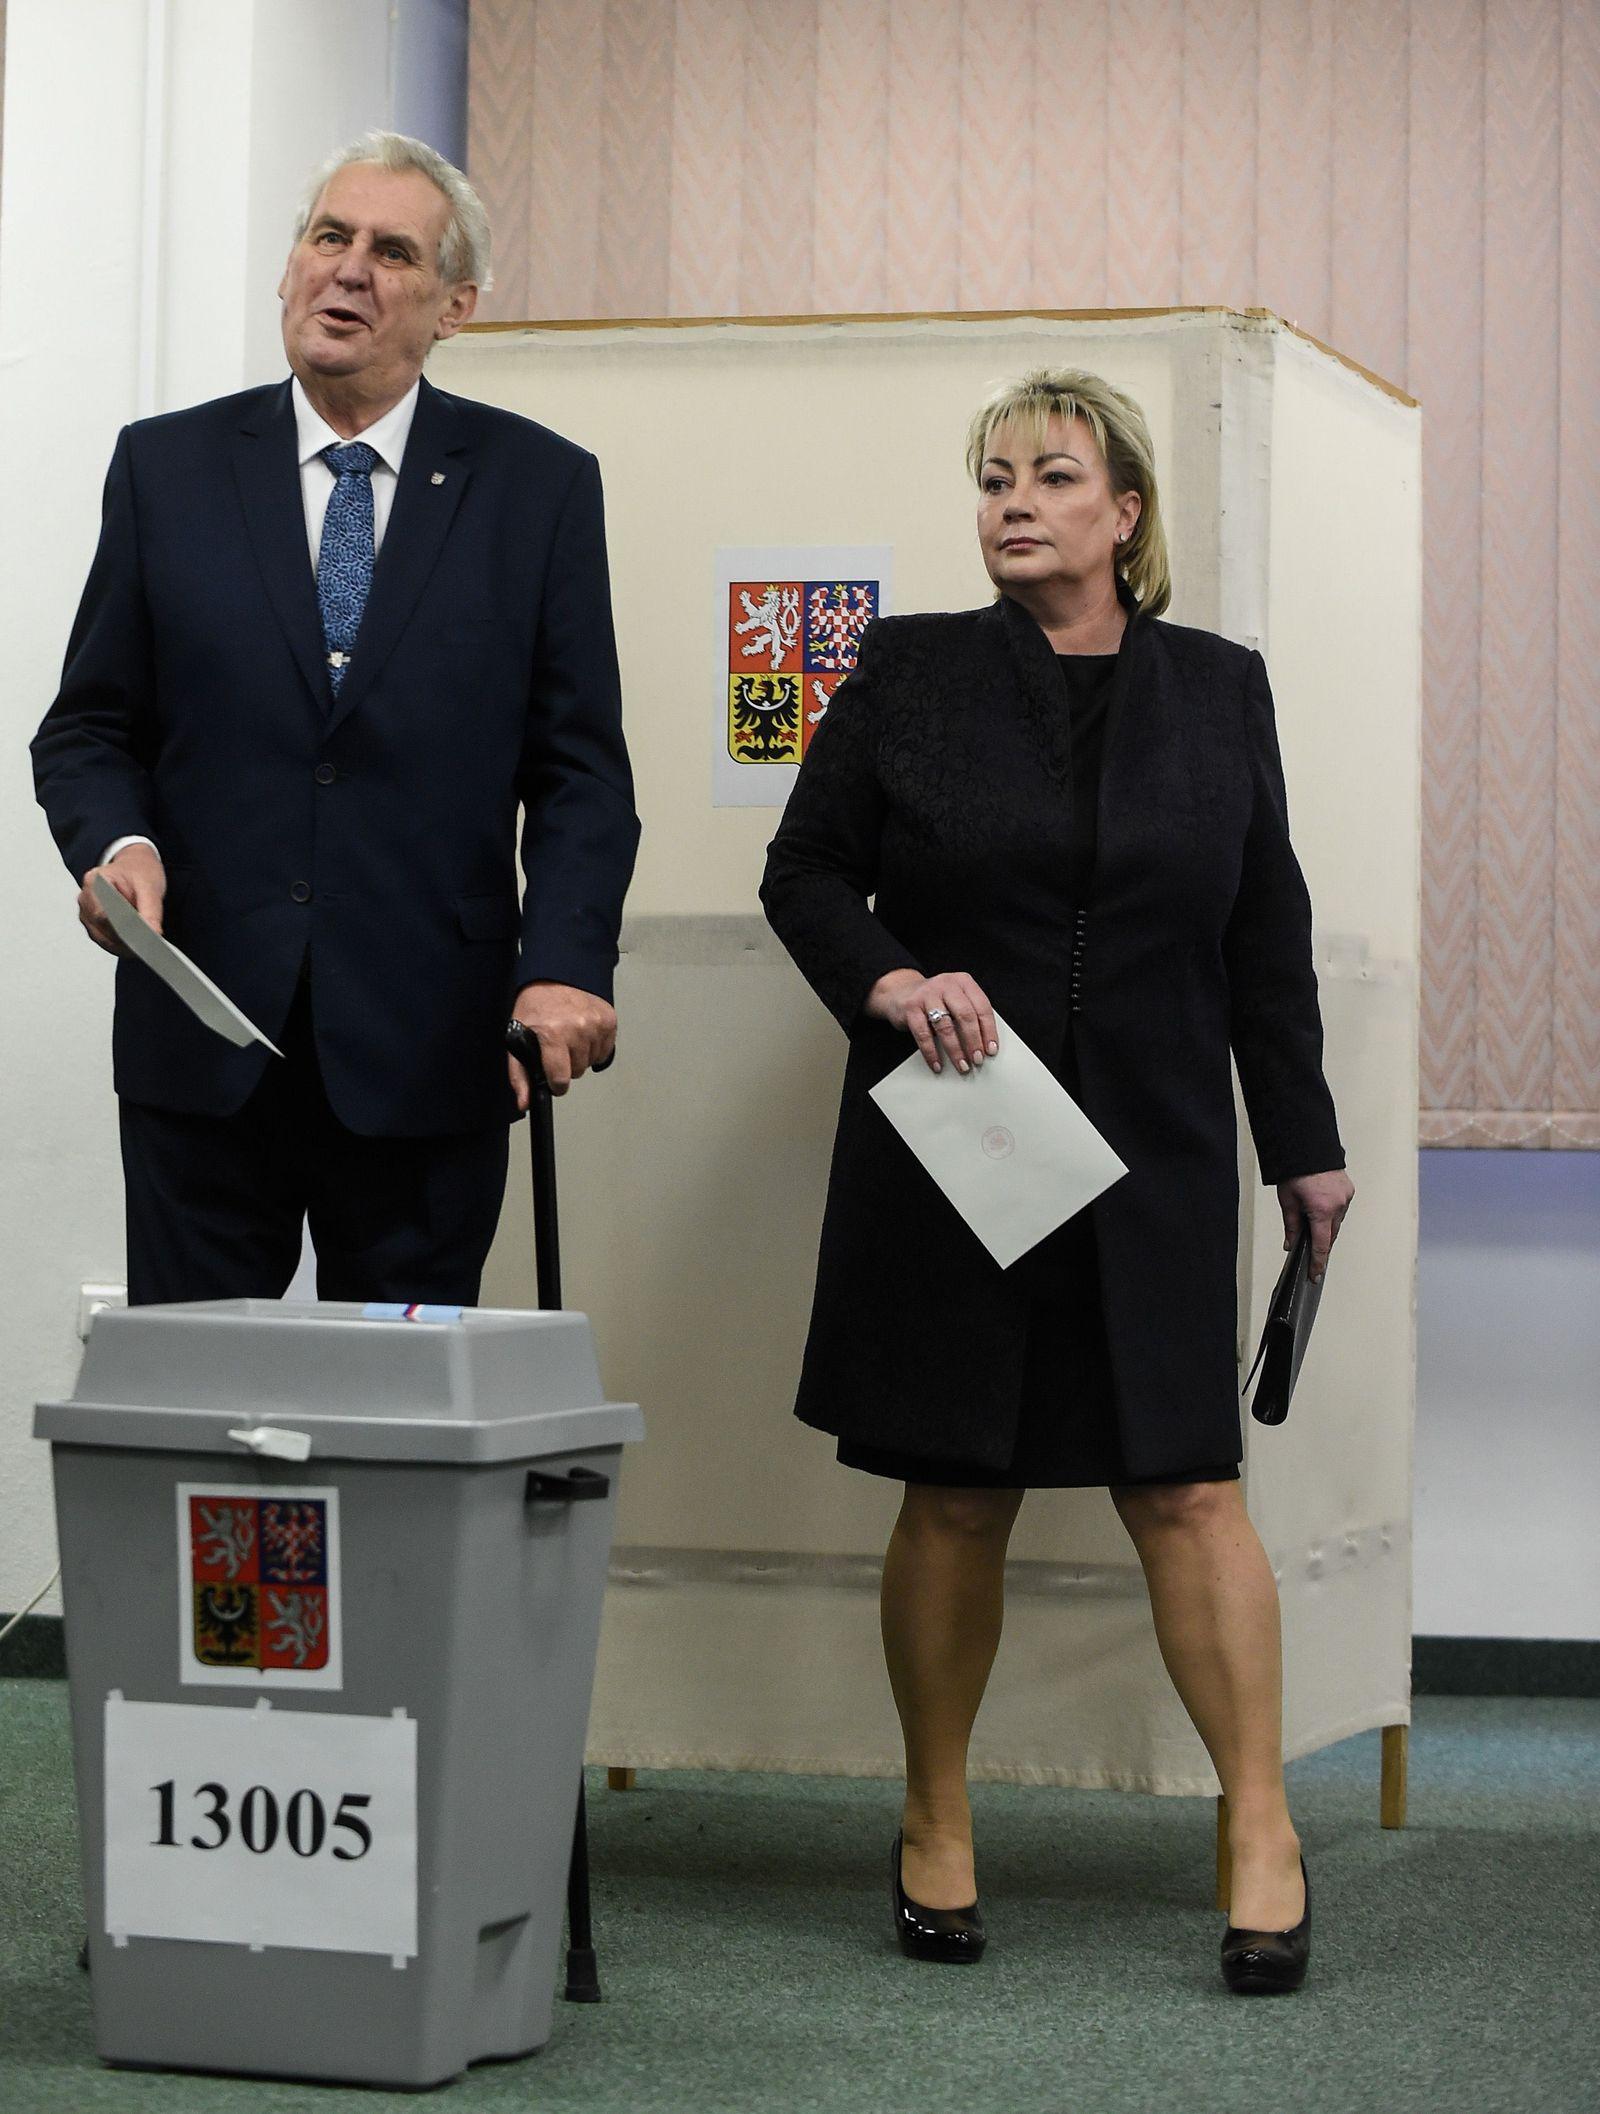 CZECH-POLITICS-VOTE-FEMEN